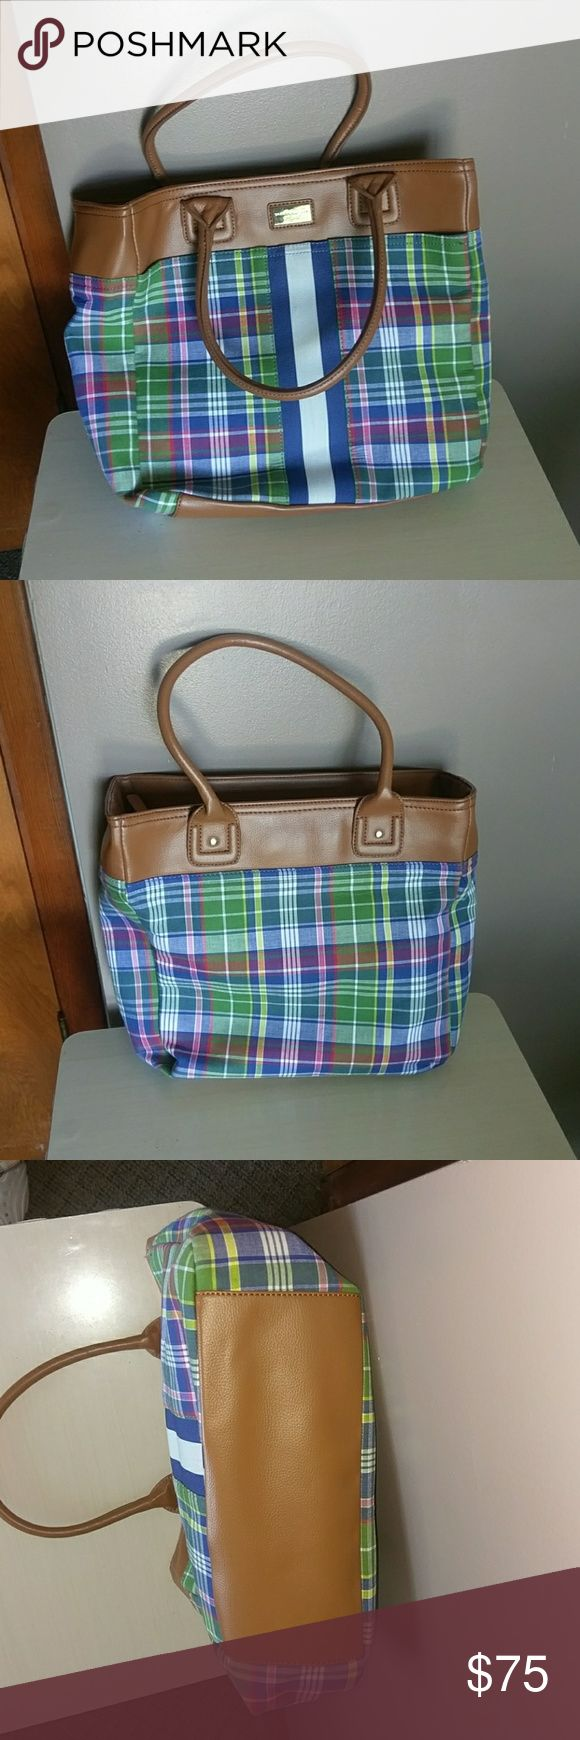 Tommy Hilfiger  bag Plaid original Tommy Hilfiger bag ! Excellent condition- better than like new! Tommy Hilfiger Bags Totes